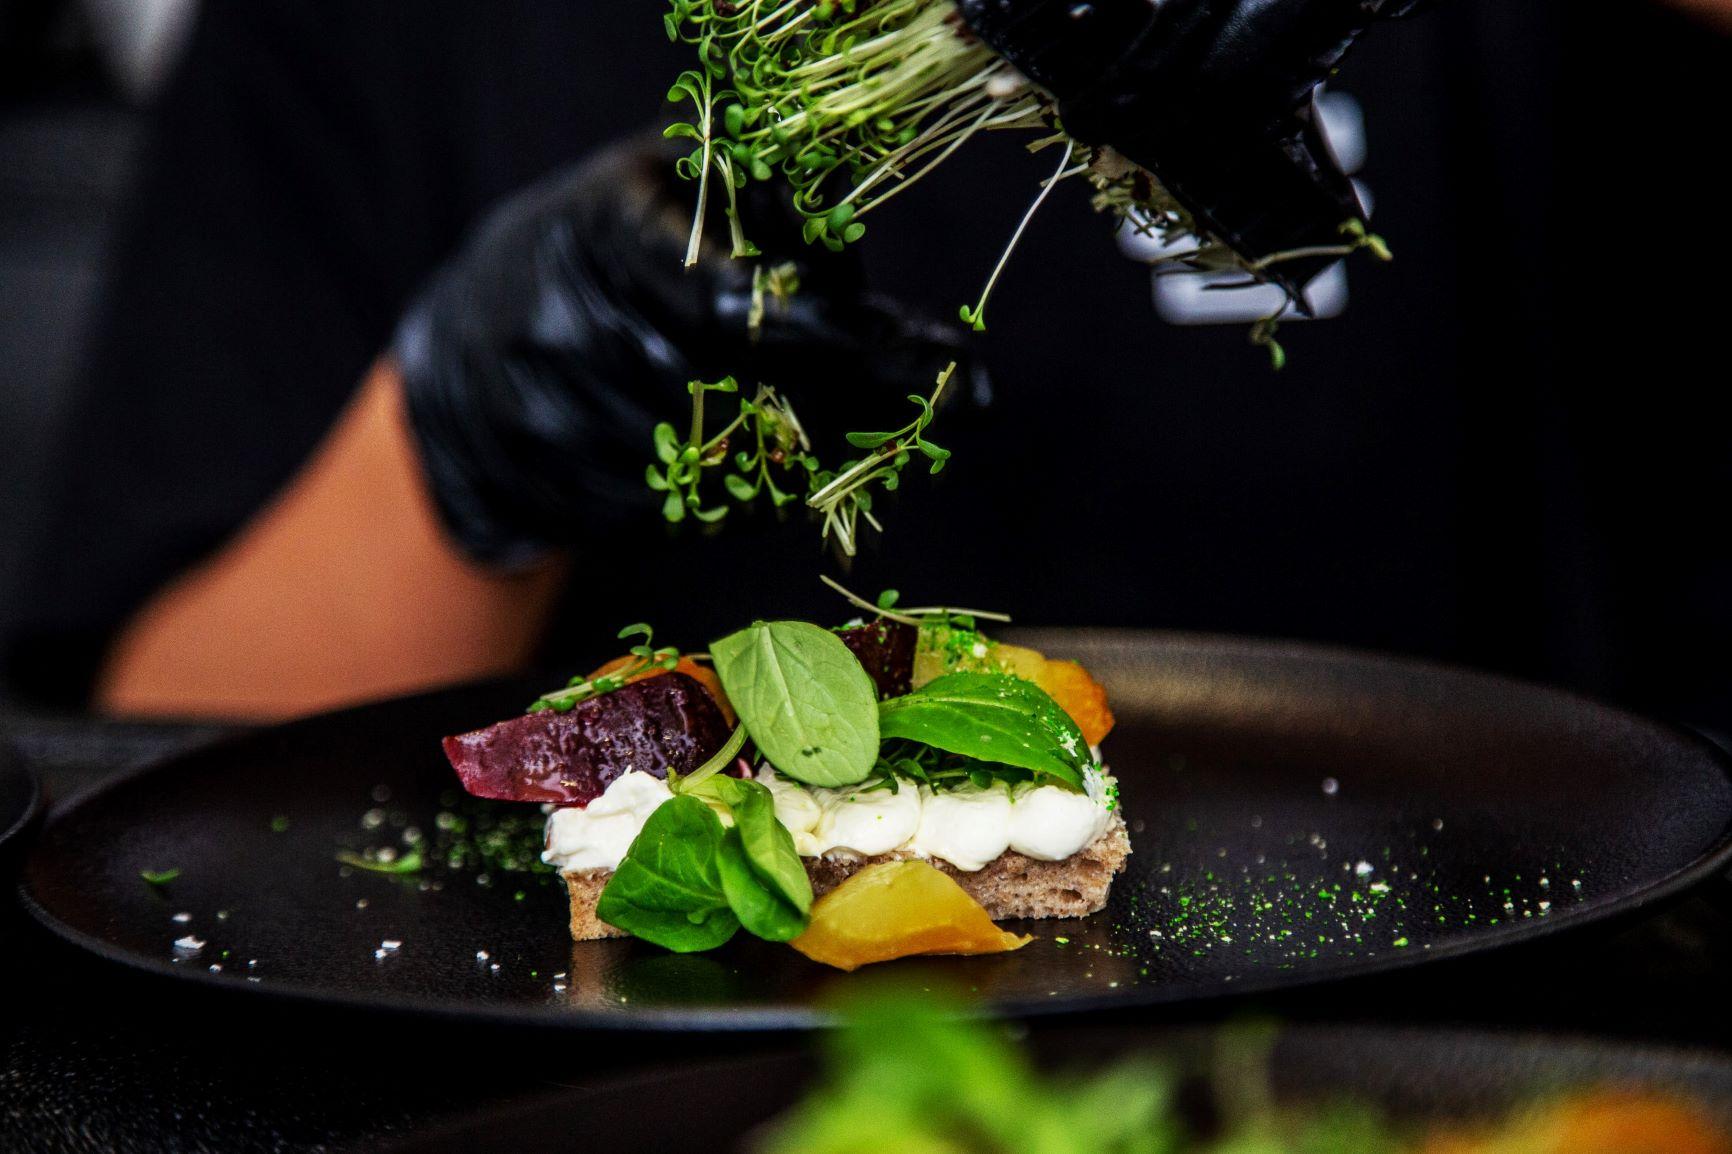 190820-MHB-Helmchen-Dinner-offenblende-KTO-44 Berlin Cuisine